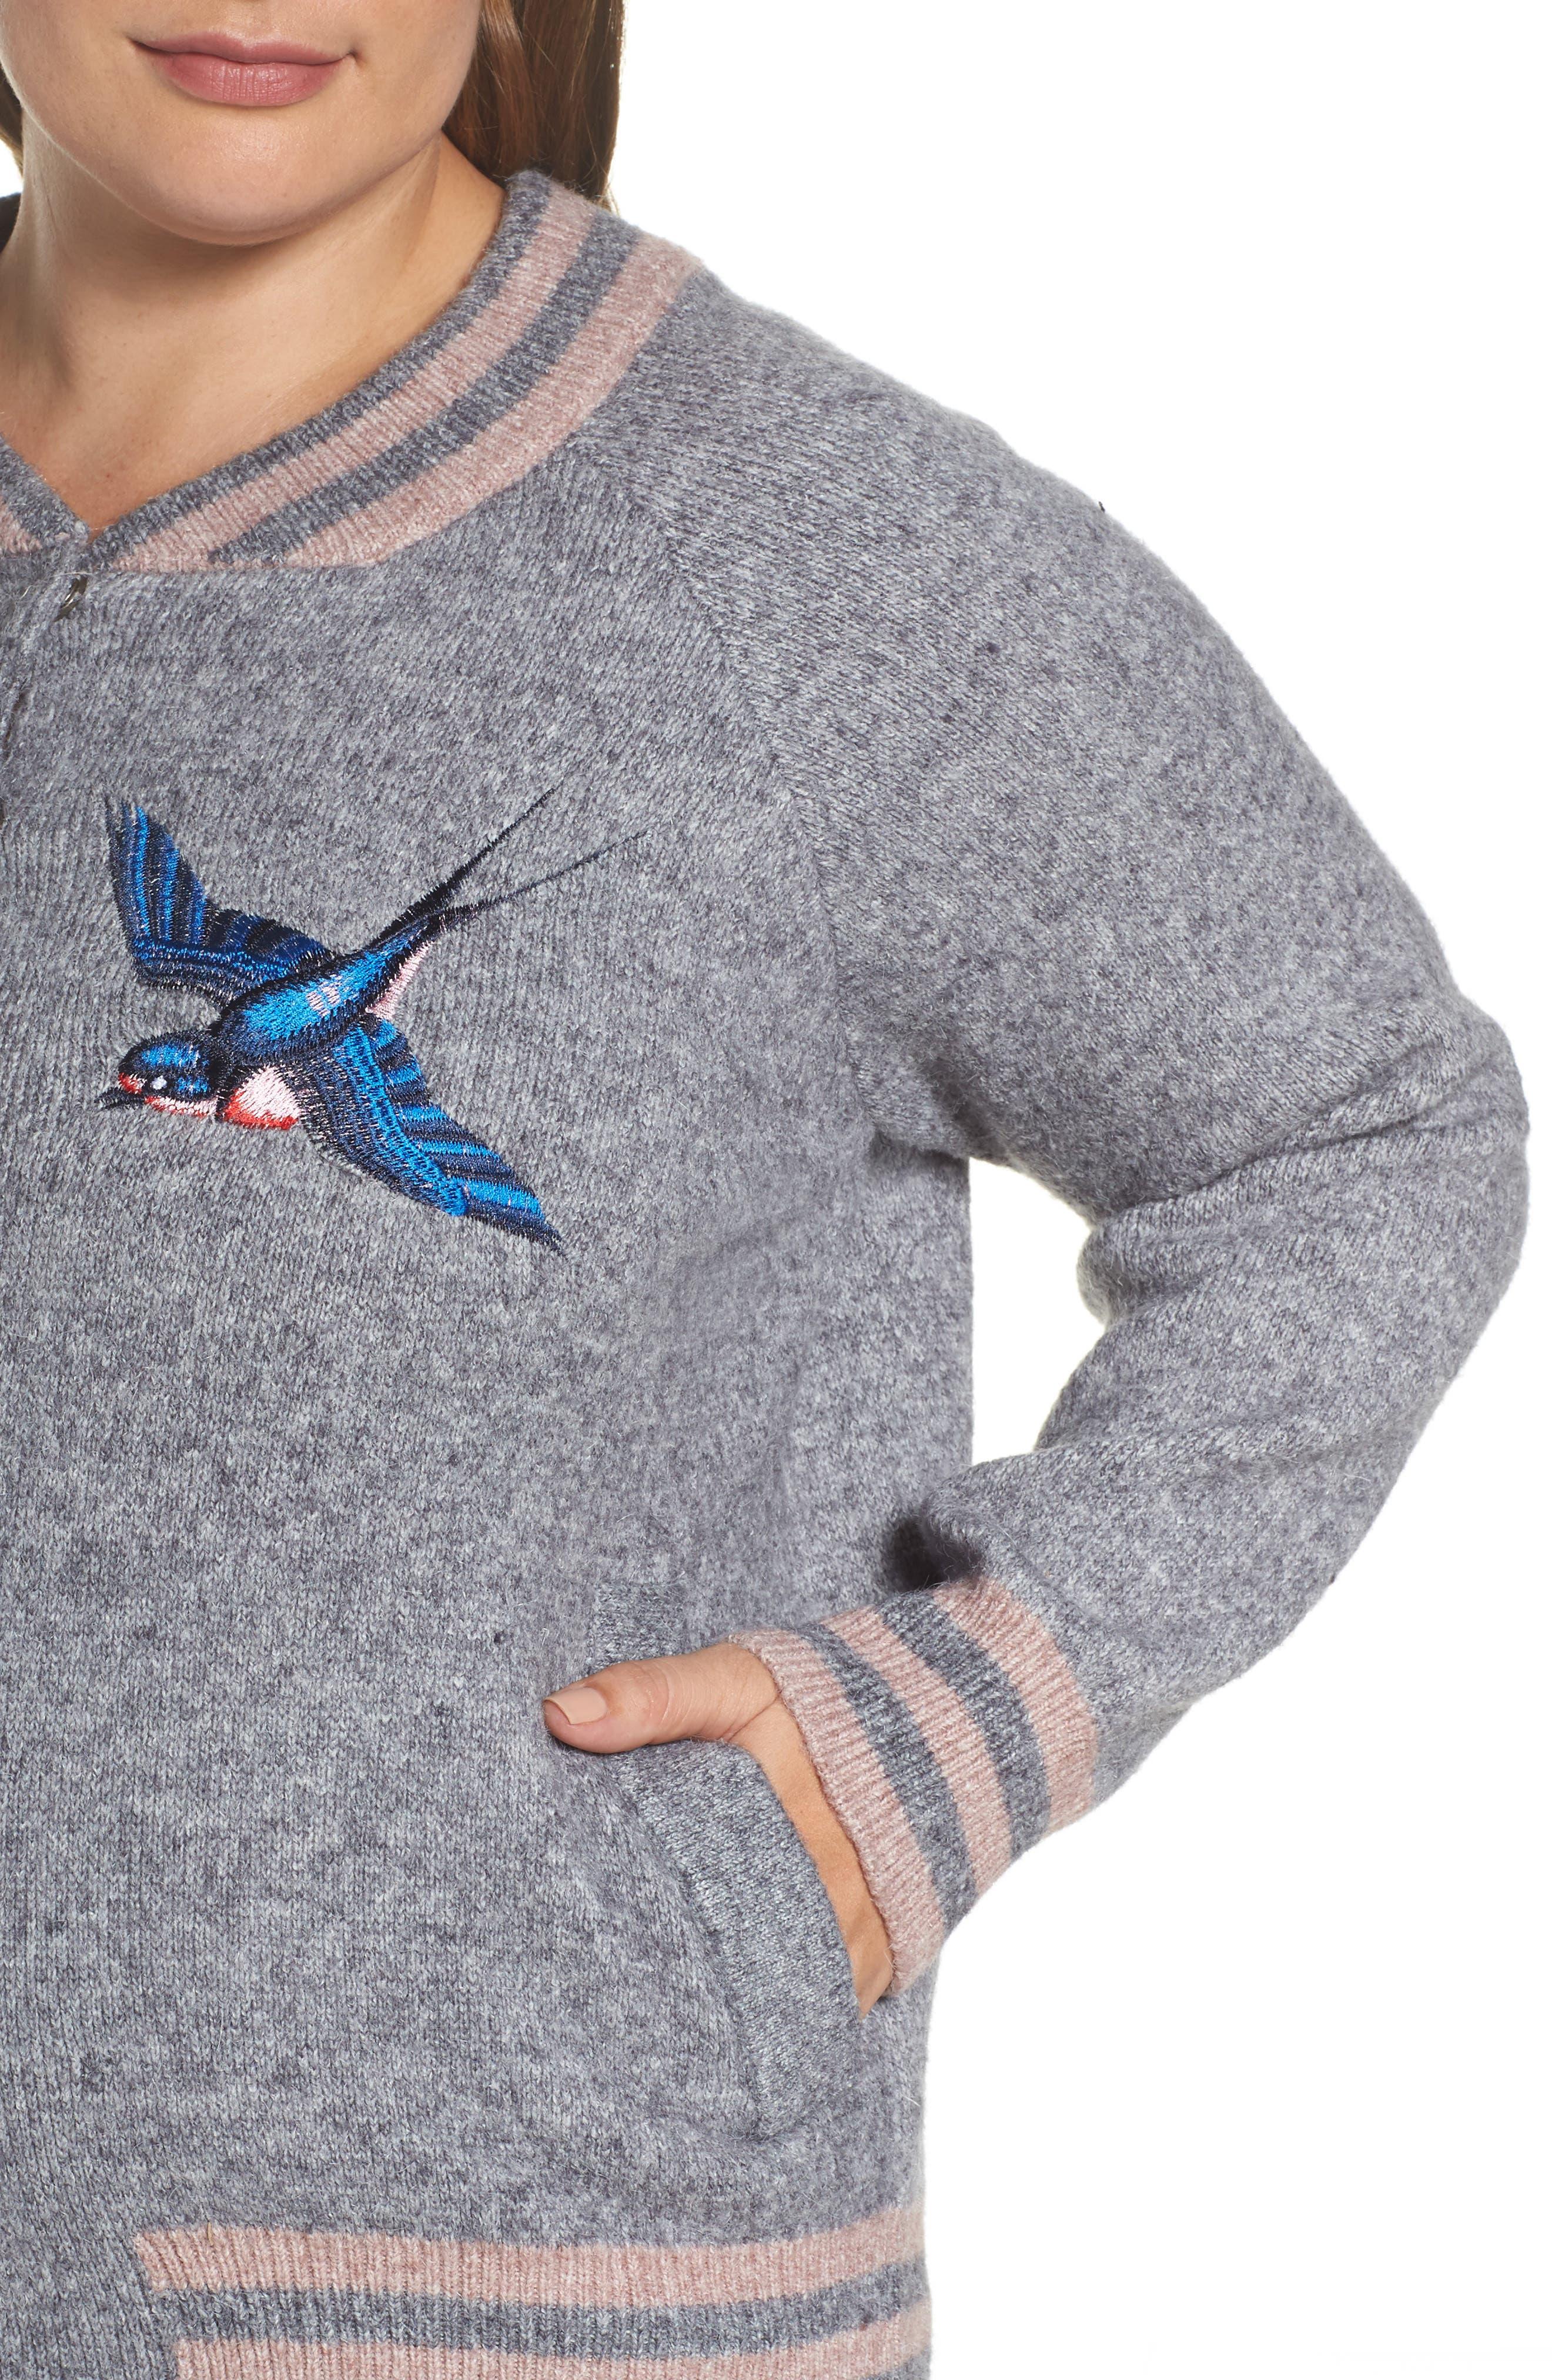 Zanja Embroidered Knit Bomber Jacket,                             Alternate thumbnail 4, color,                             Medium Grey Melange